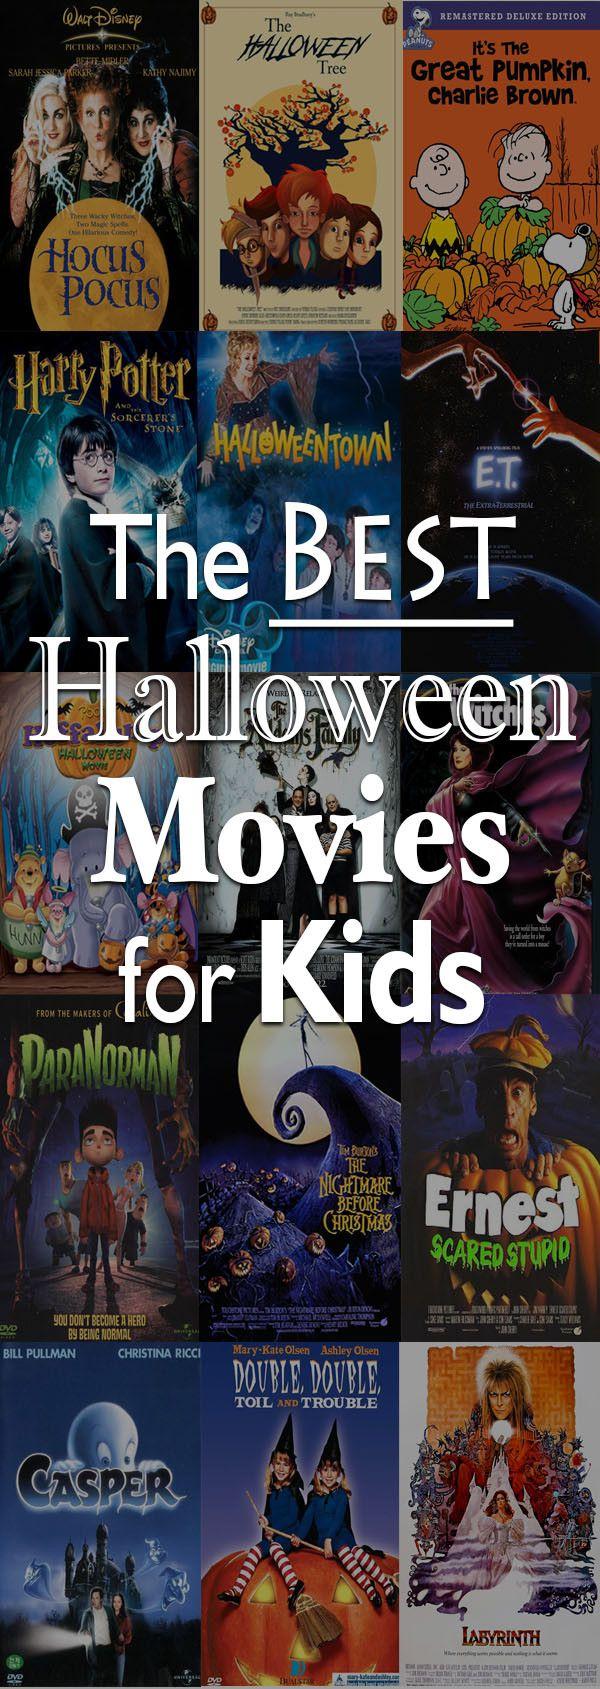 The Best Halloween Movies for Kids Best halloween movies